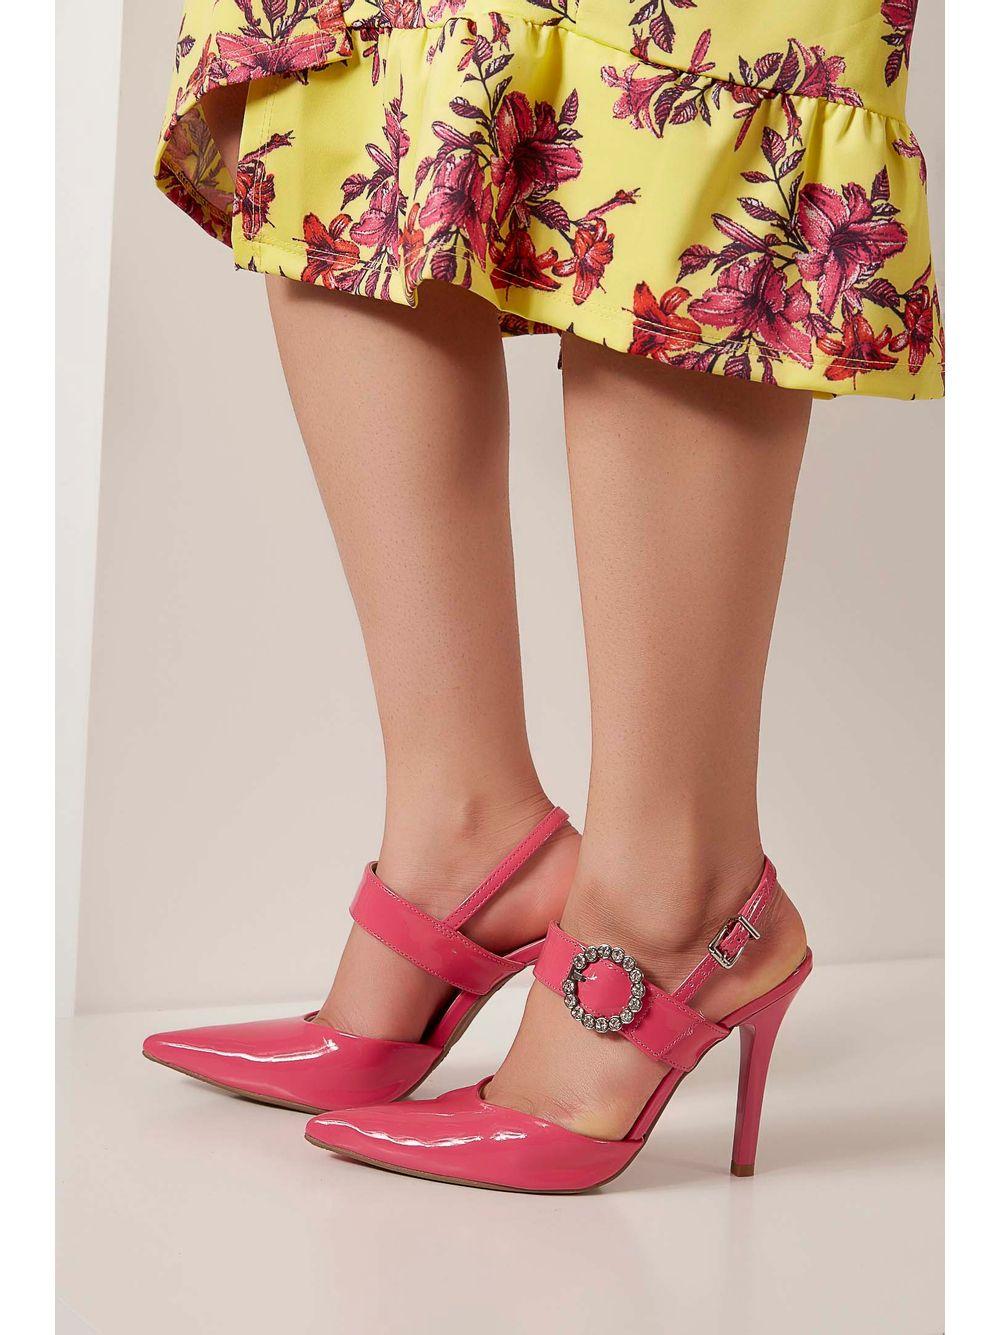 c48b9df653 Sapato Scarpin Via Marte Fivela Pink - pittol